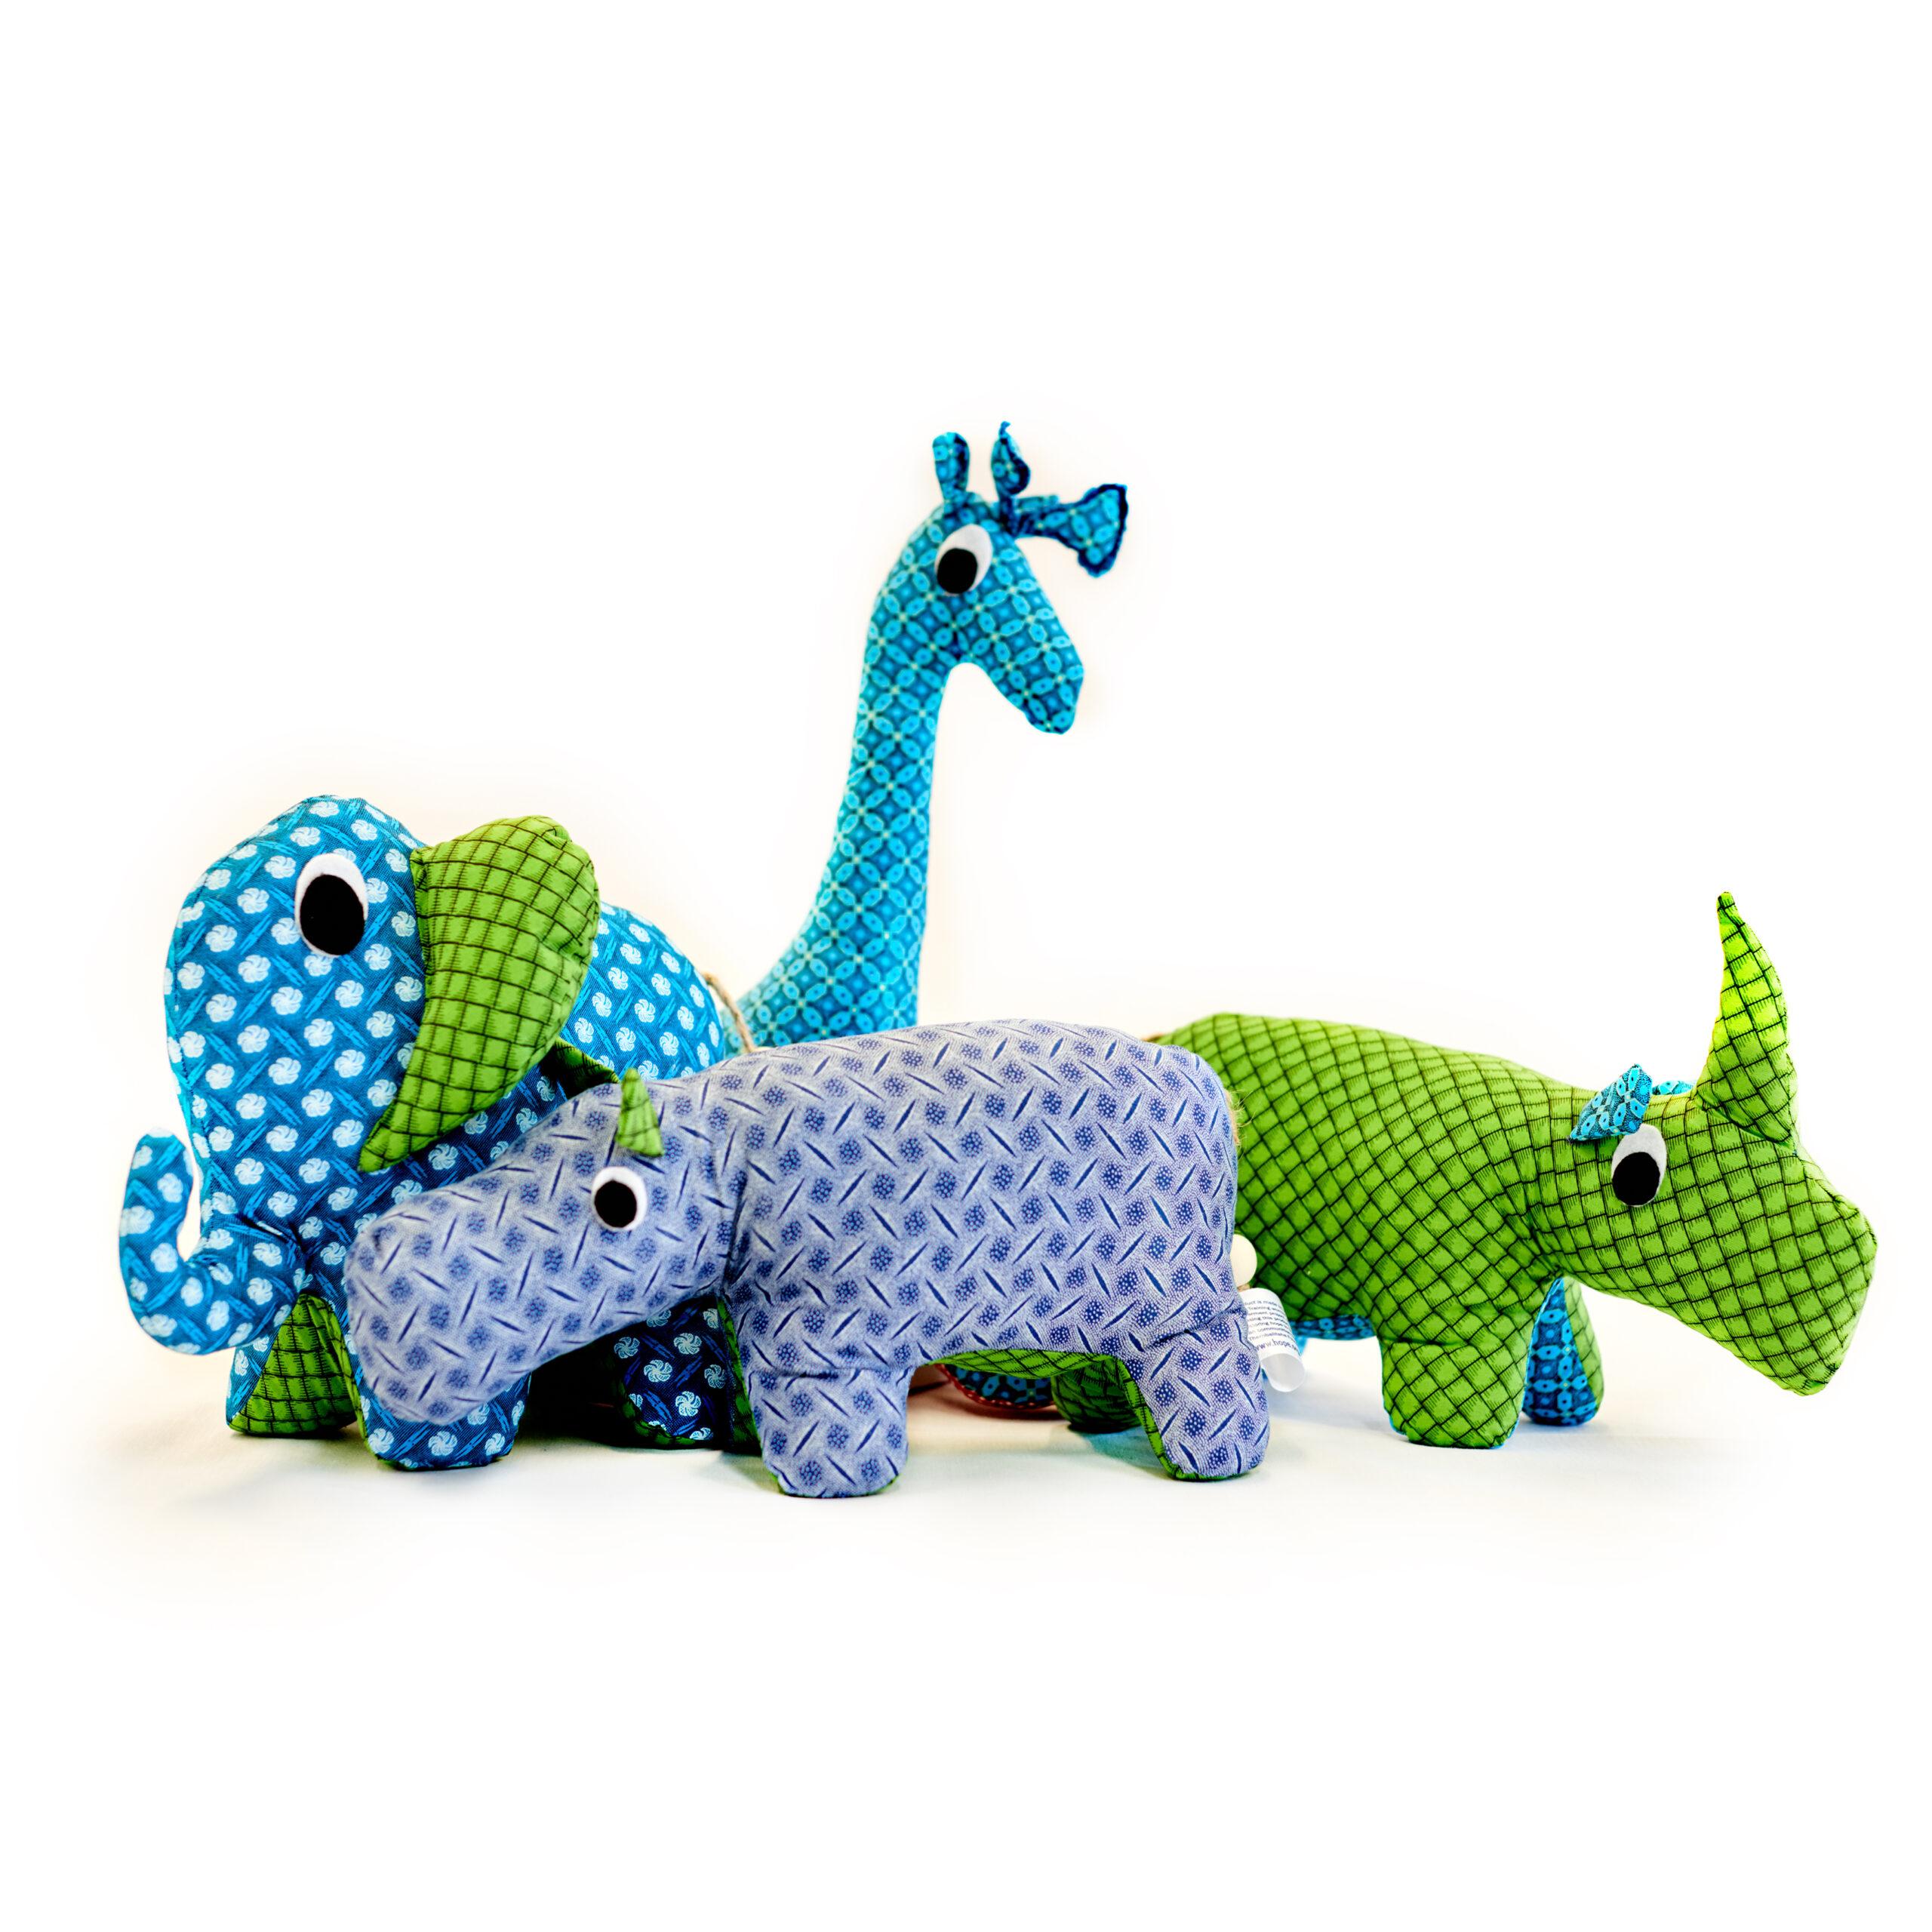 Fabric Animals The Forgood Blog